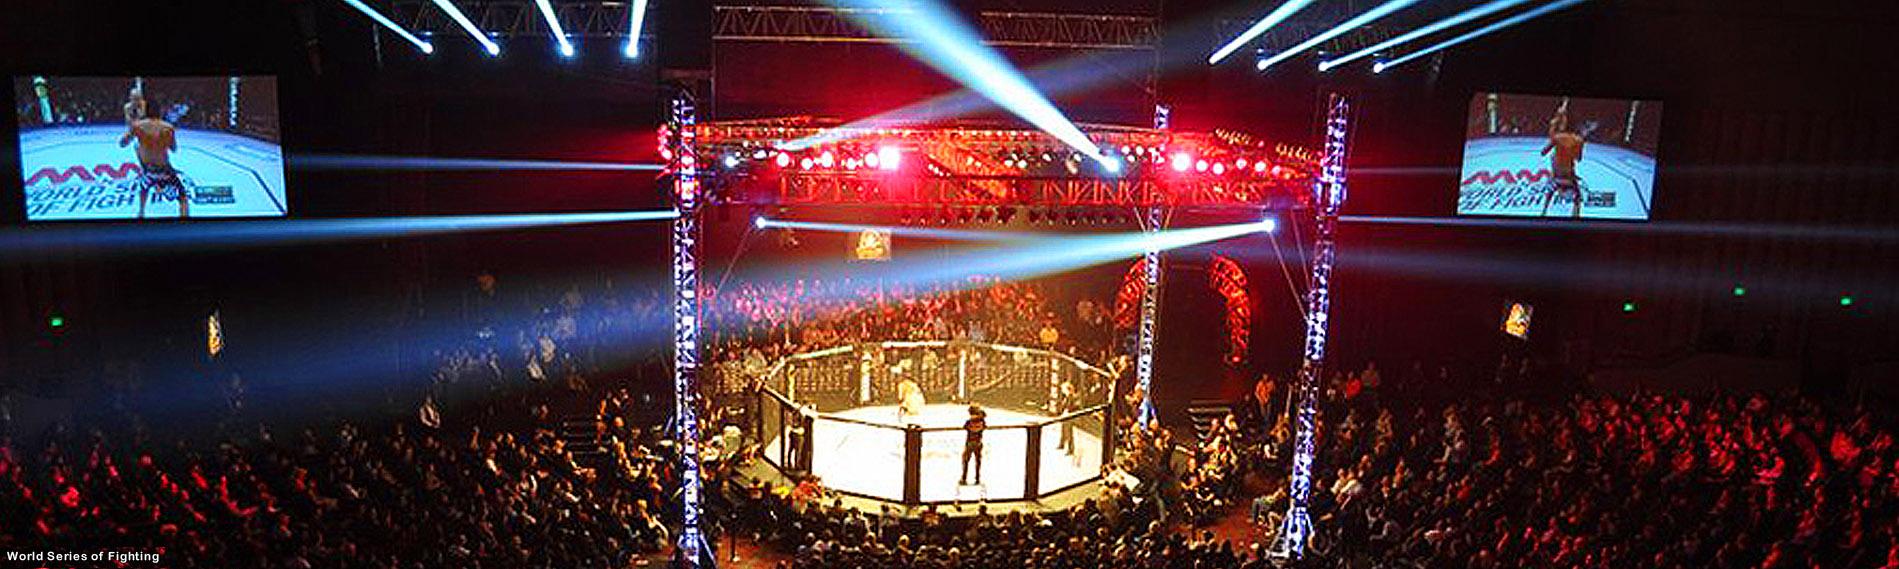 World Series of Fighting vuelve al sur de la Florida con Jessica Aguilar